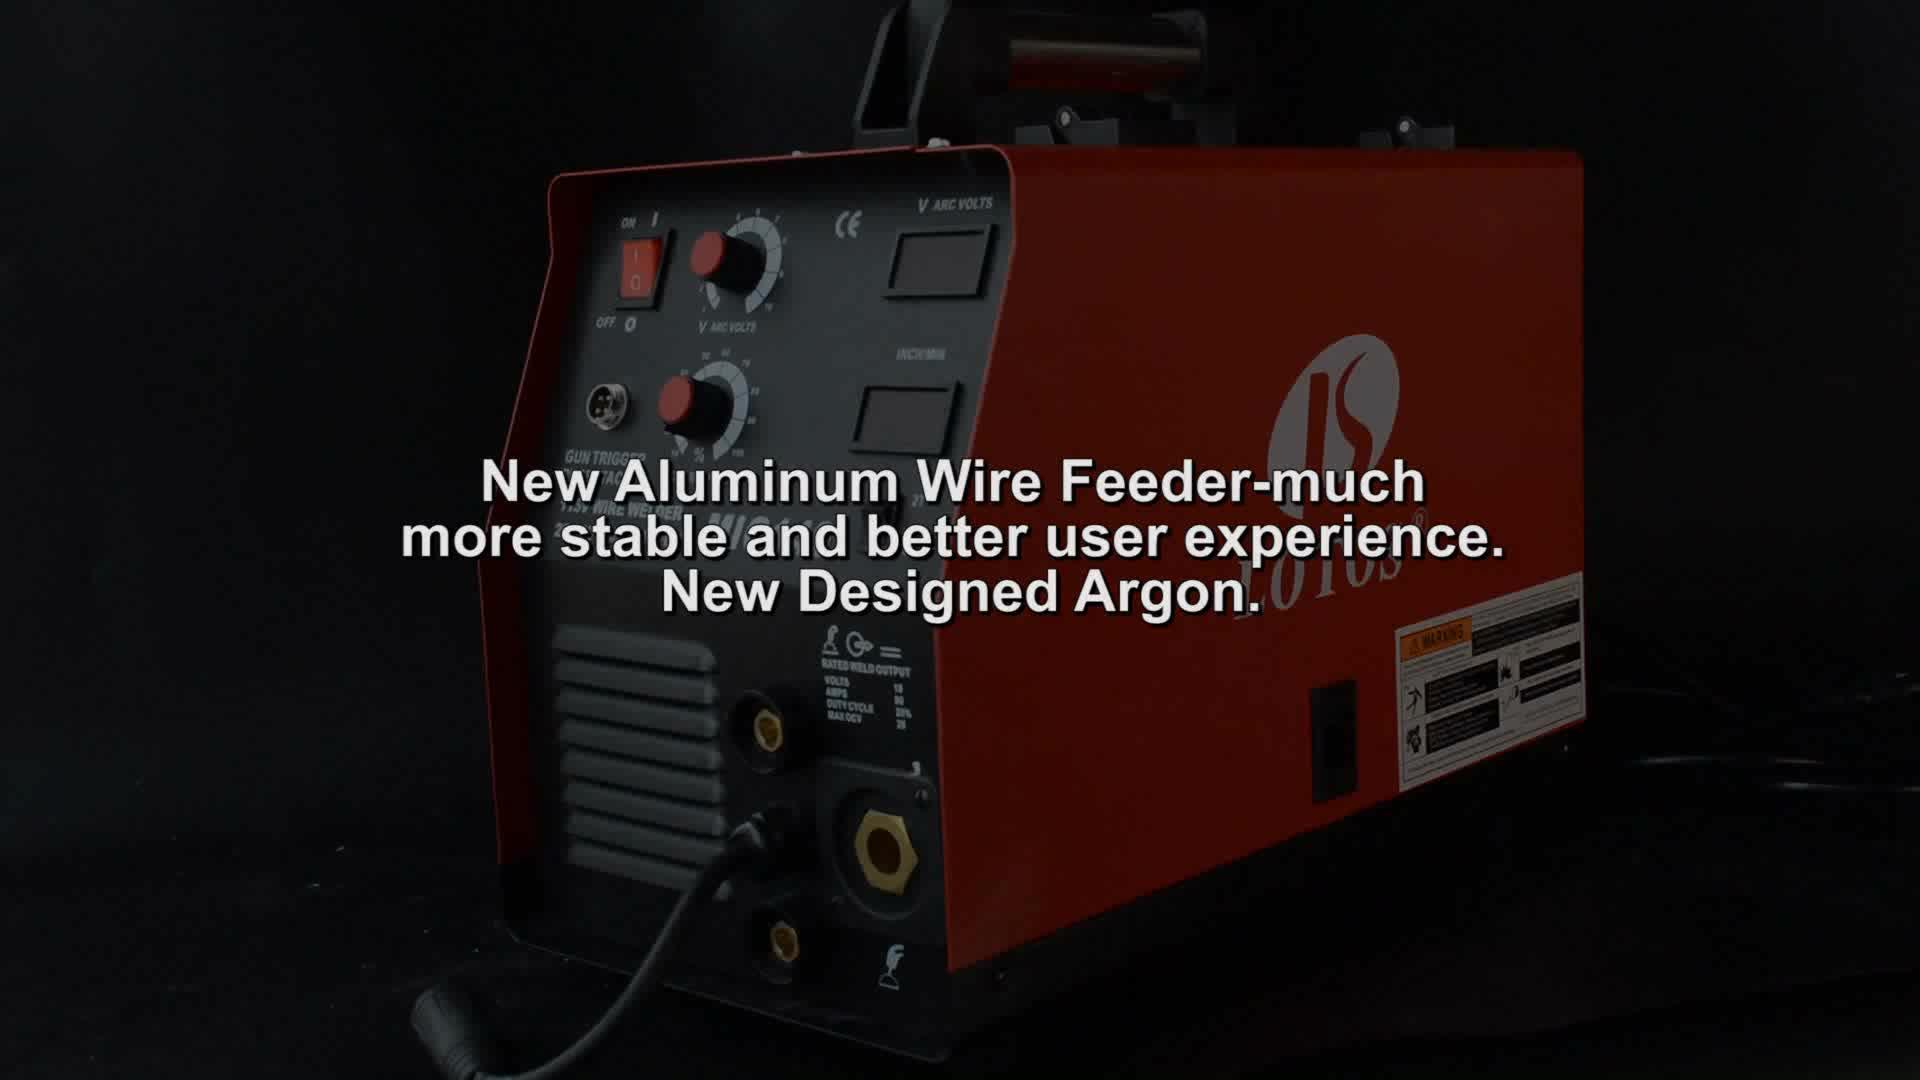 LOTOS MIG140 MOSFET High Frequency DC inverter 140A welding mig machine portable co2 aluminum mig welder